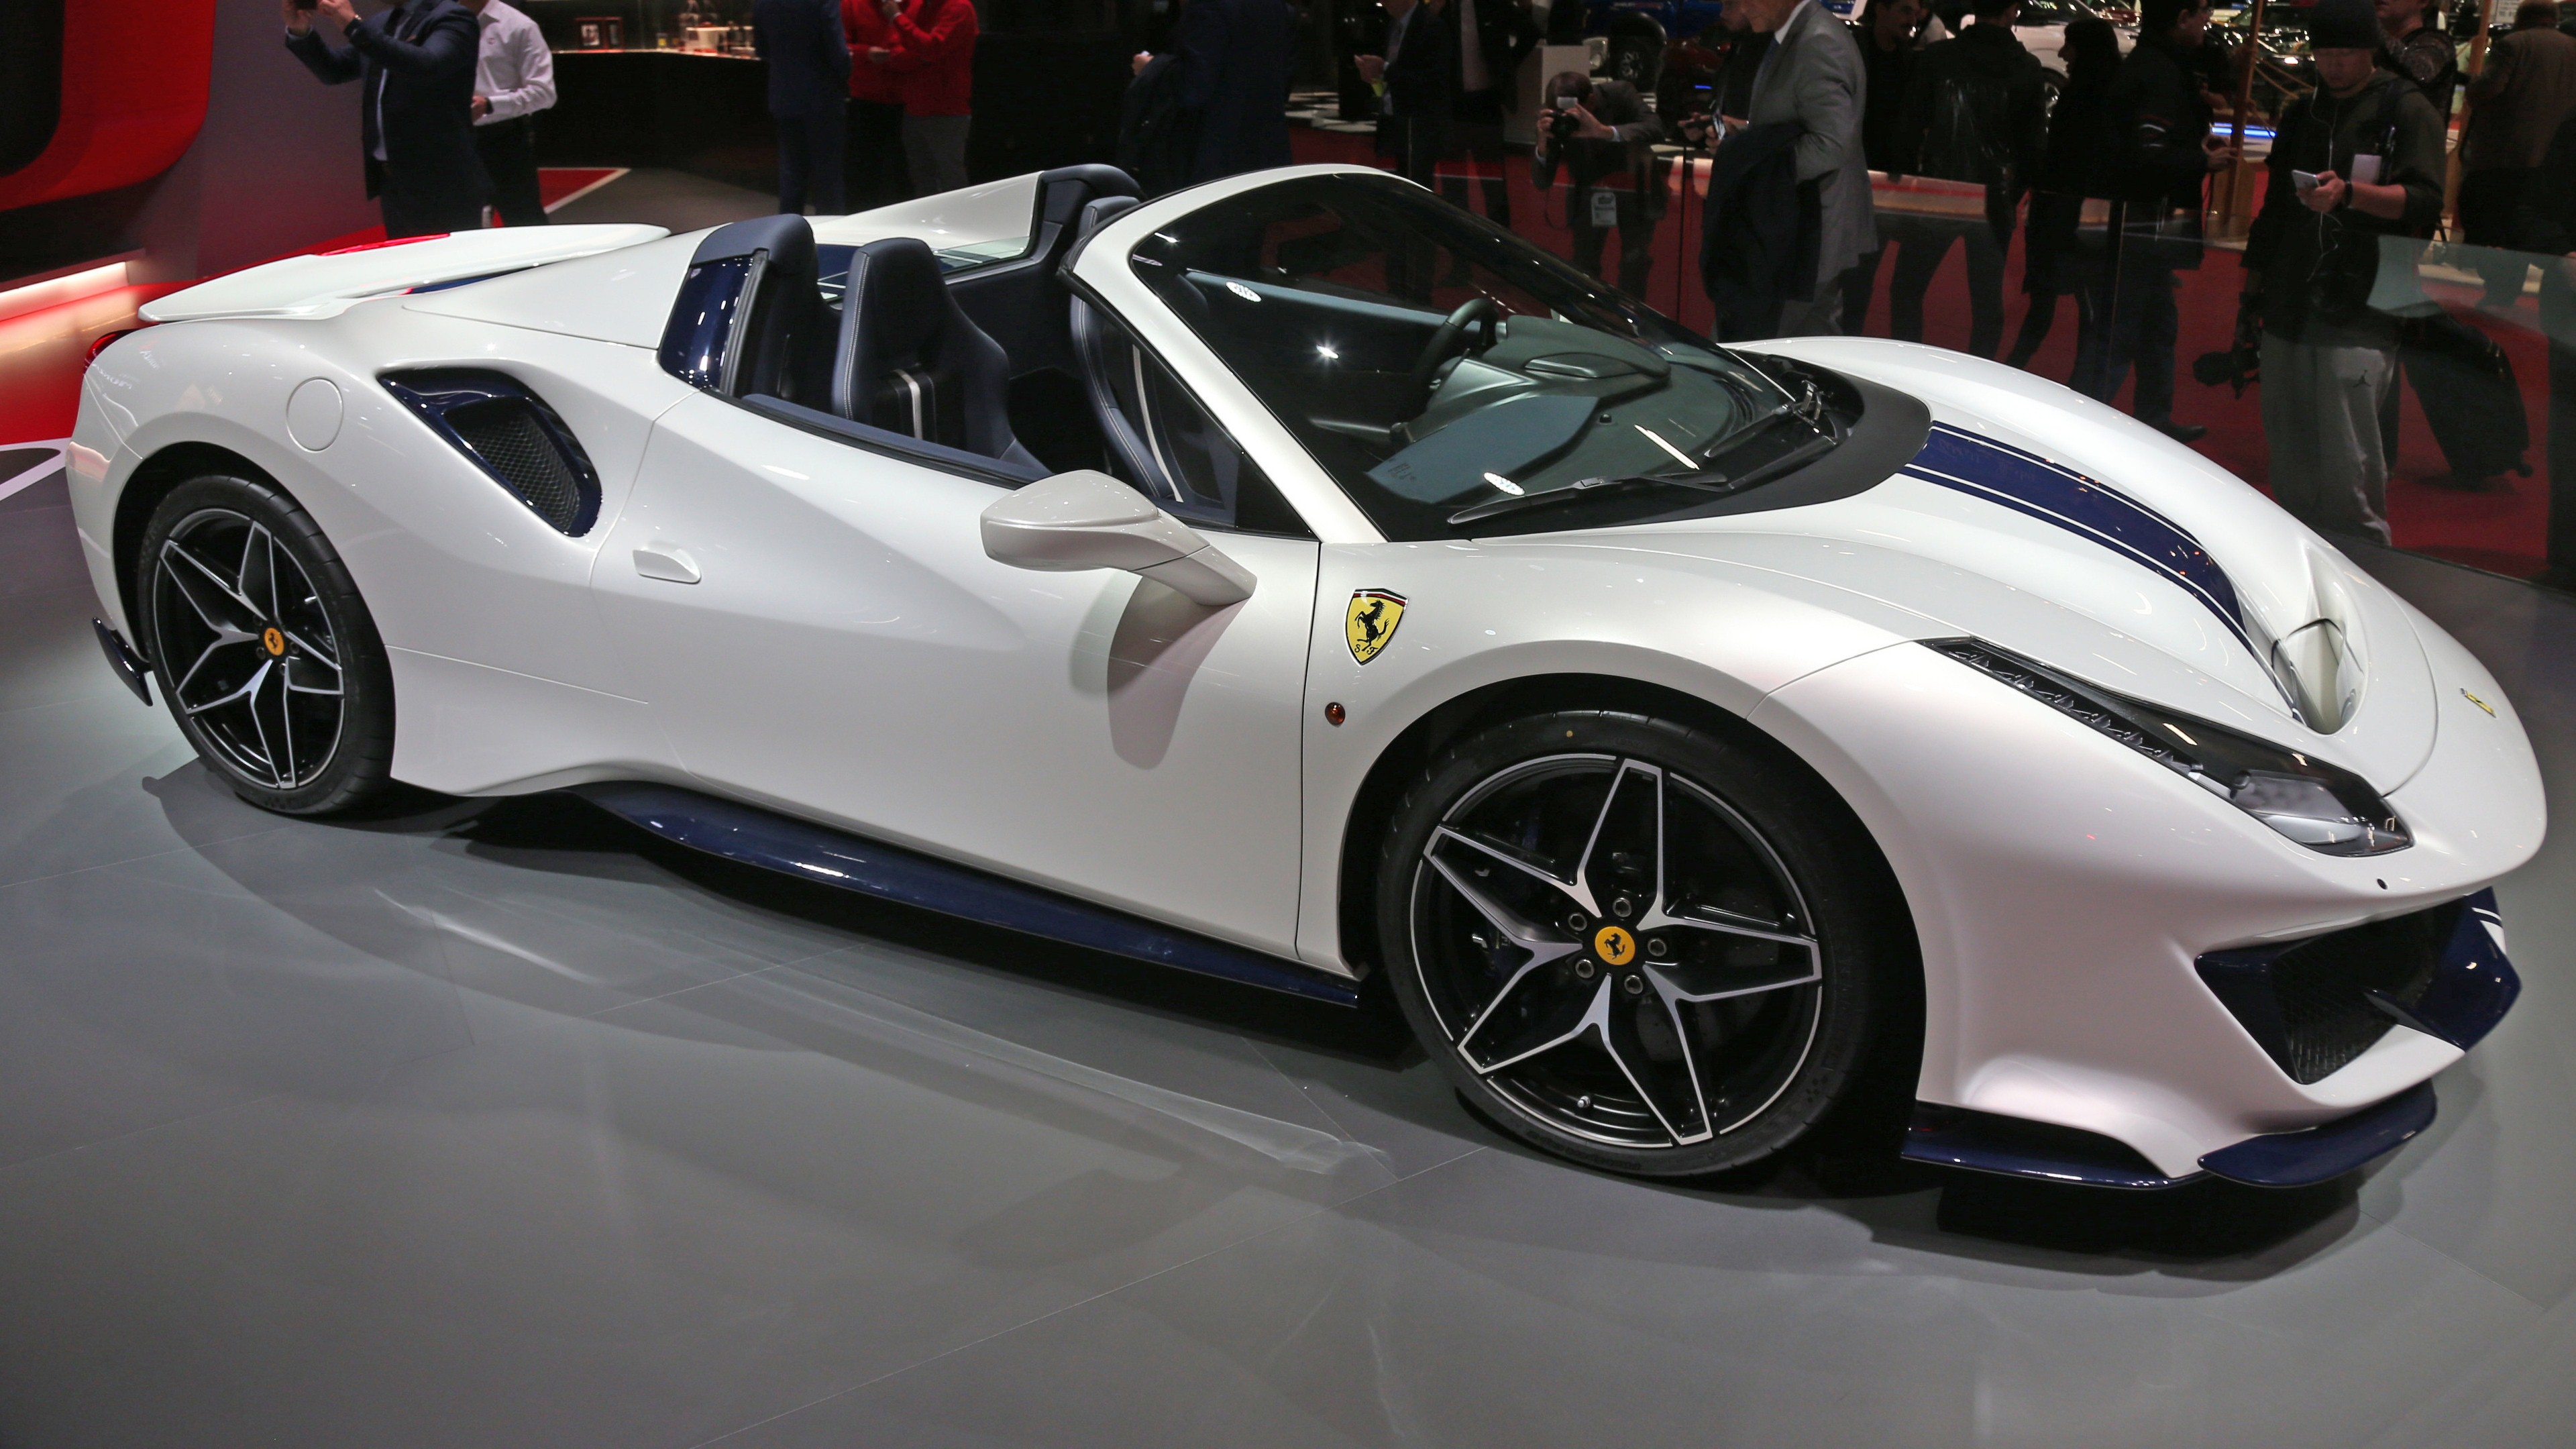 2019 Ferrari 488 Pista Spider 4k Car , Hd Ferrari Cars 2019